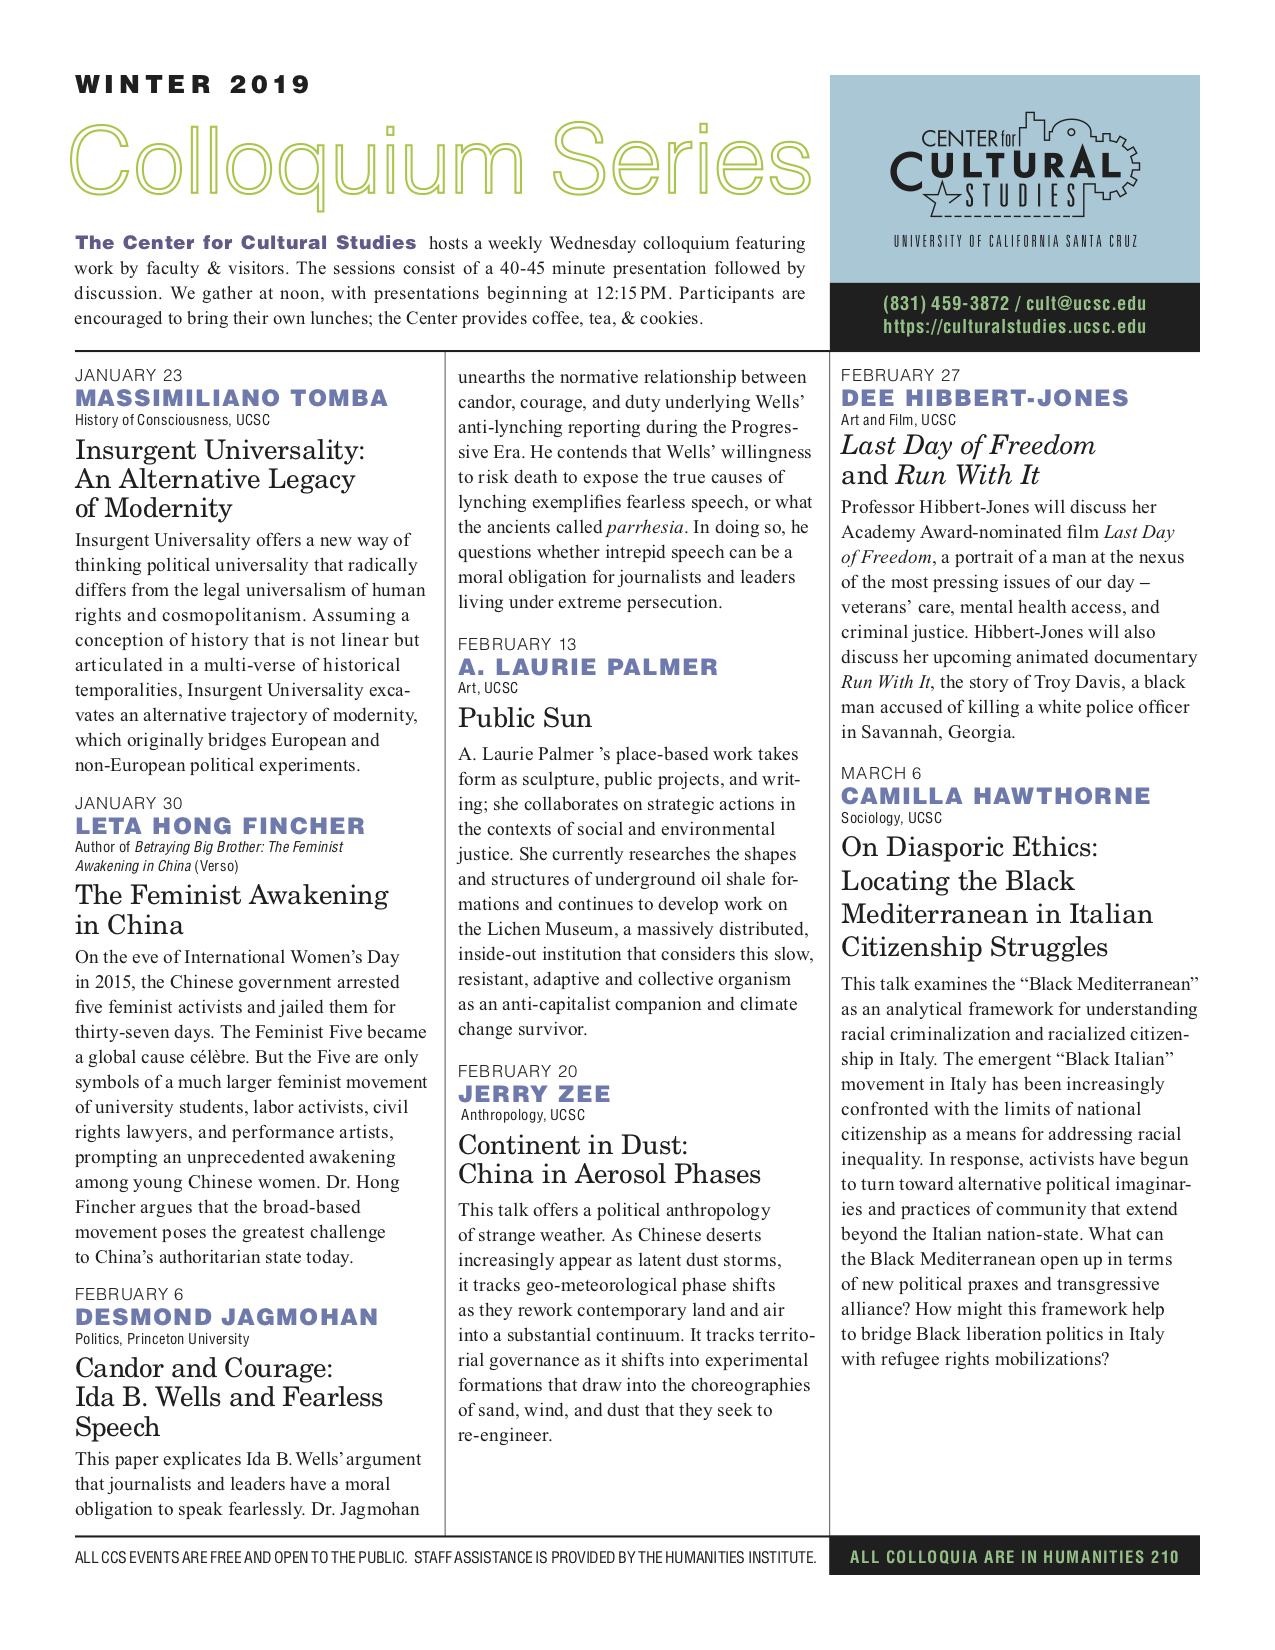 Center for Cultural Studies Winter 2019 Newsletter